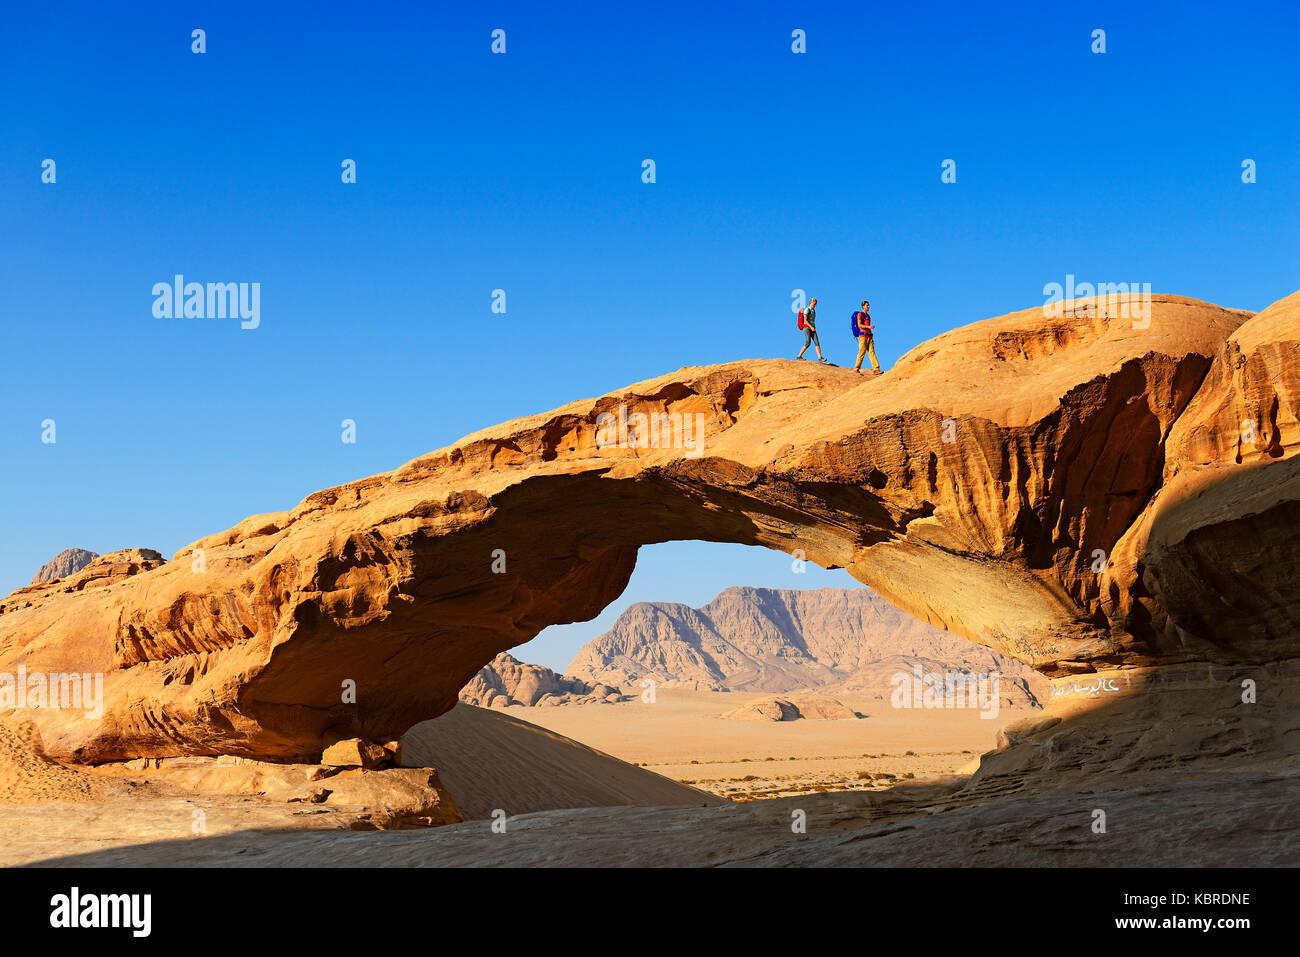 Paar Wandern am Rock-Arch namens Al Kharza, Wadi Rum, Jordanien Stockbild